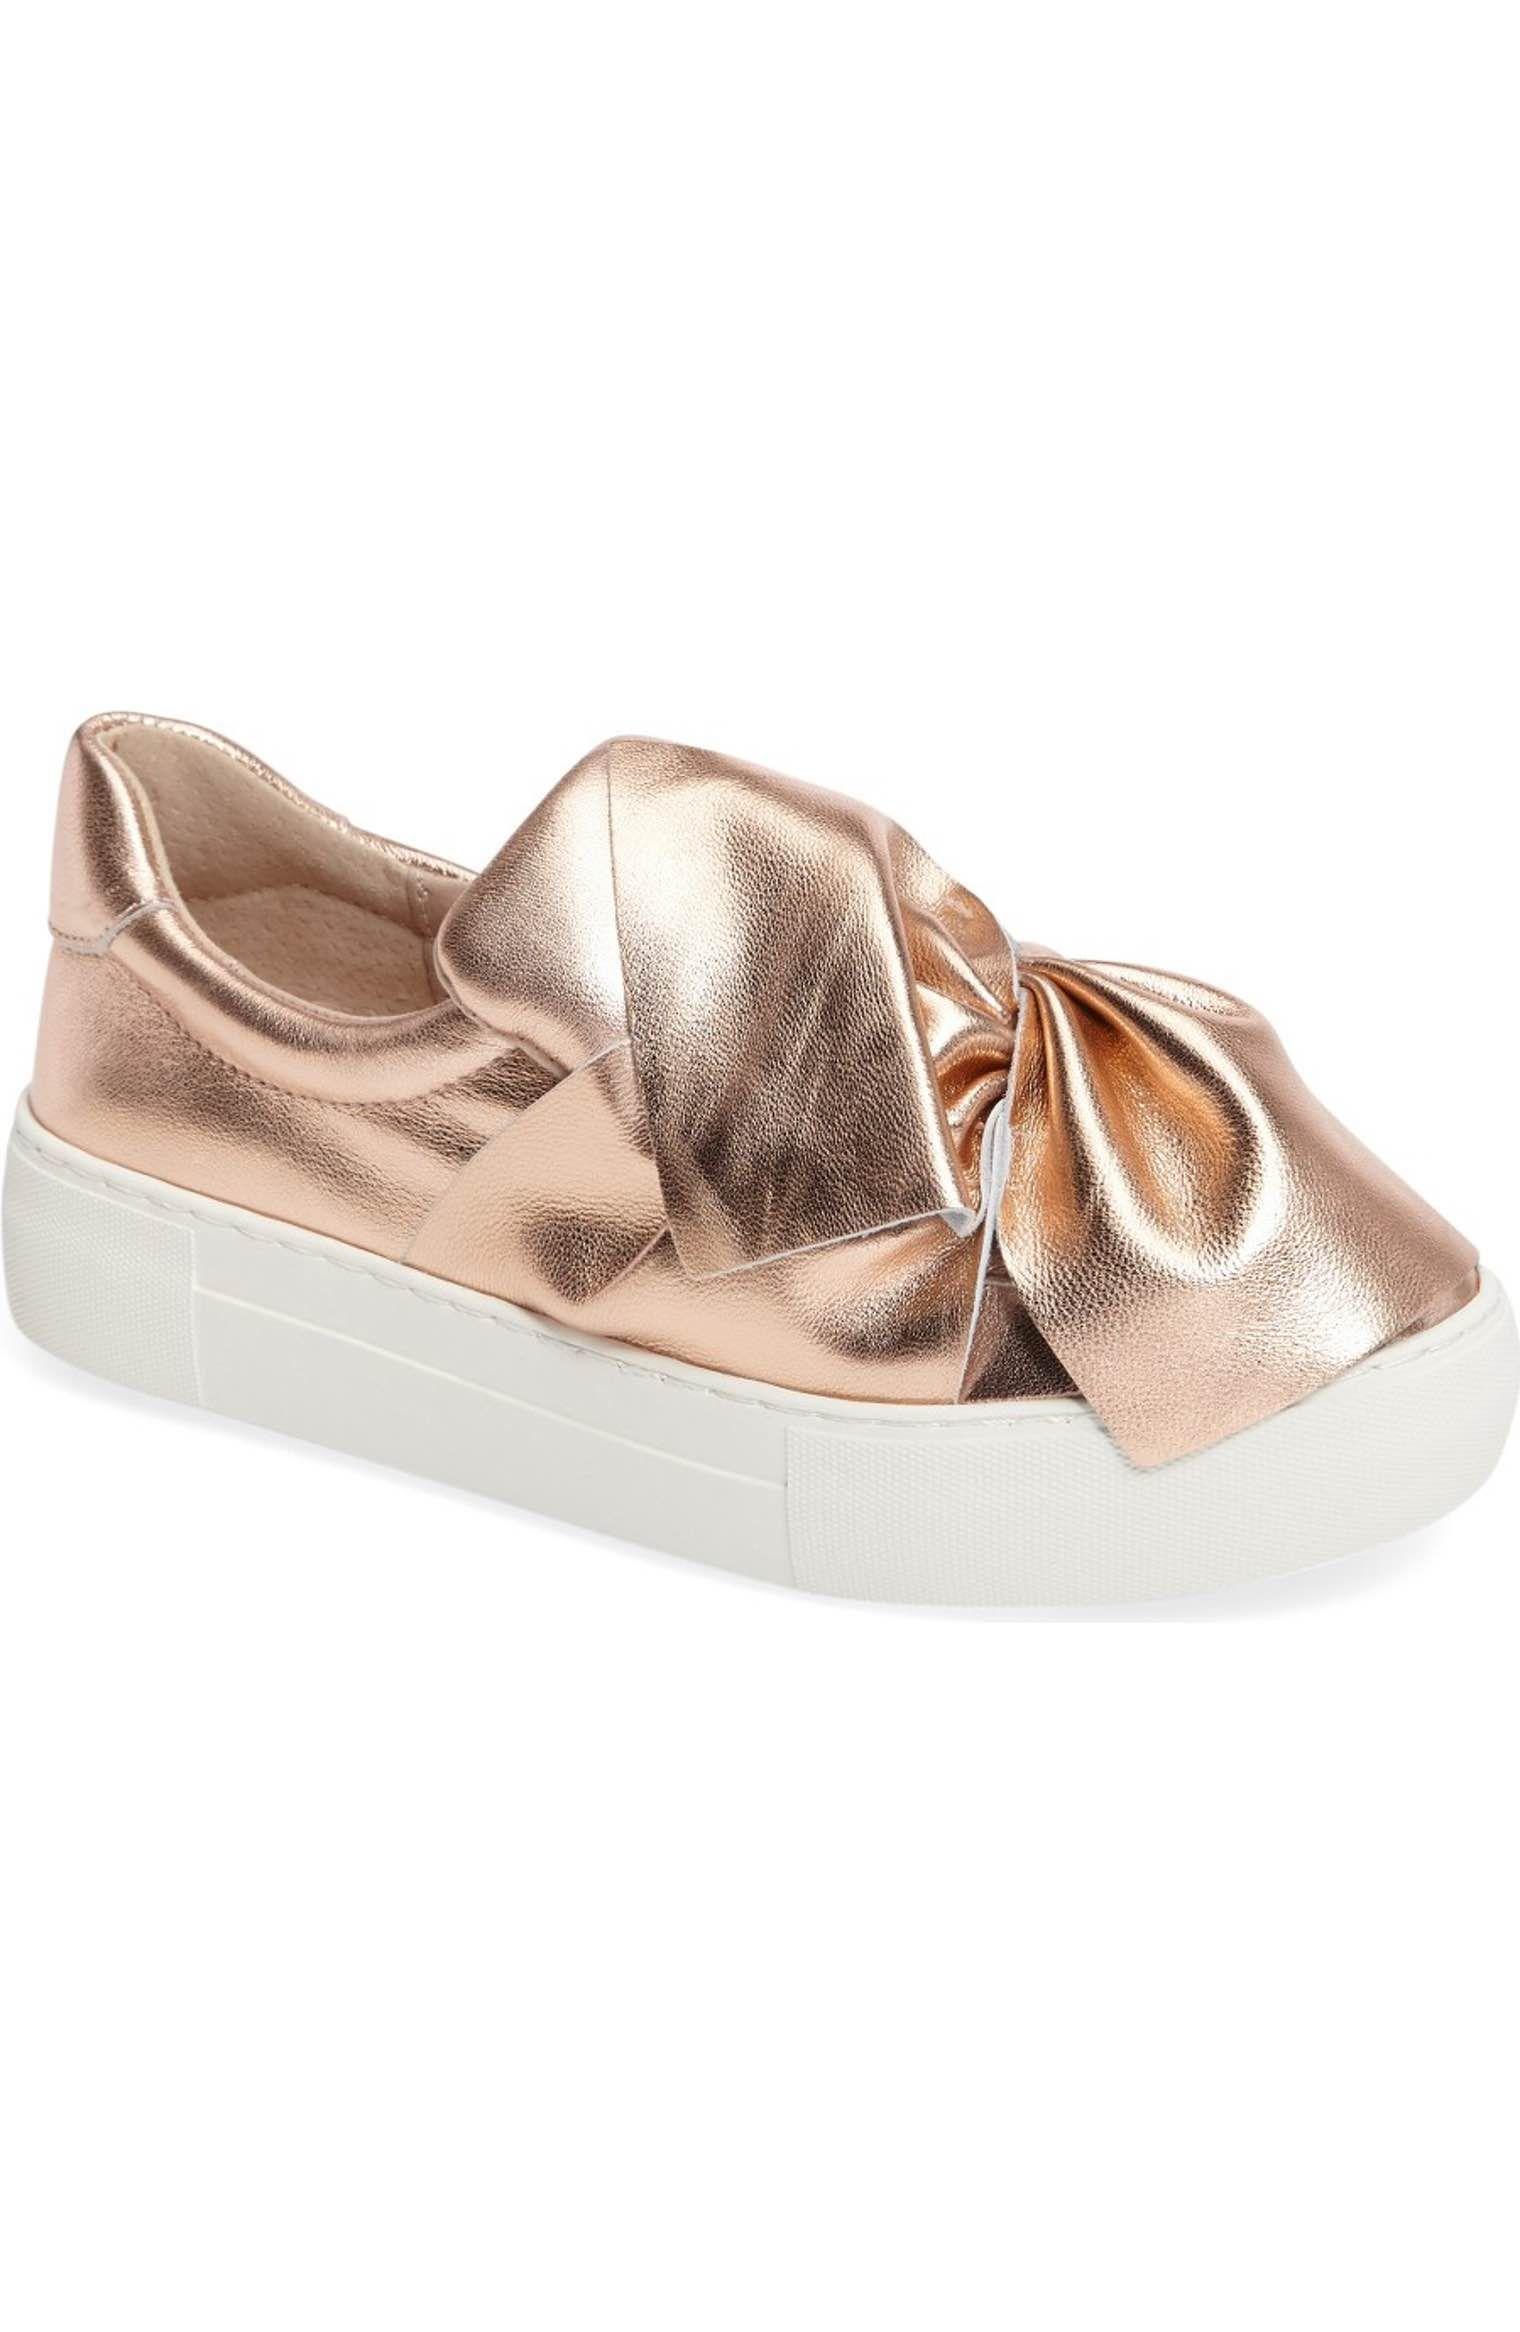 JSlides 'Annabelle' Platform Sneaker (Women | Platform slip